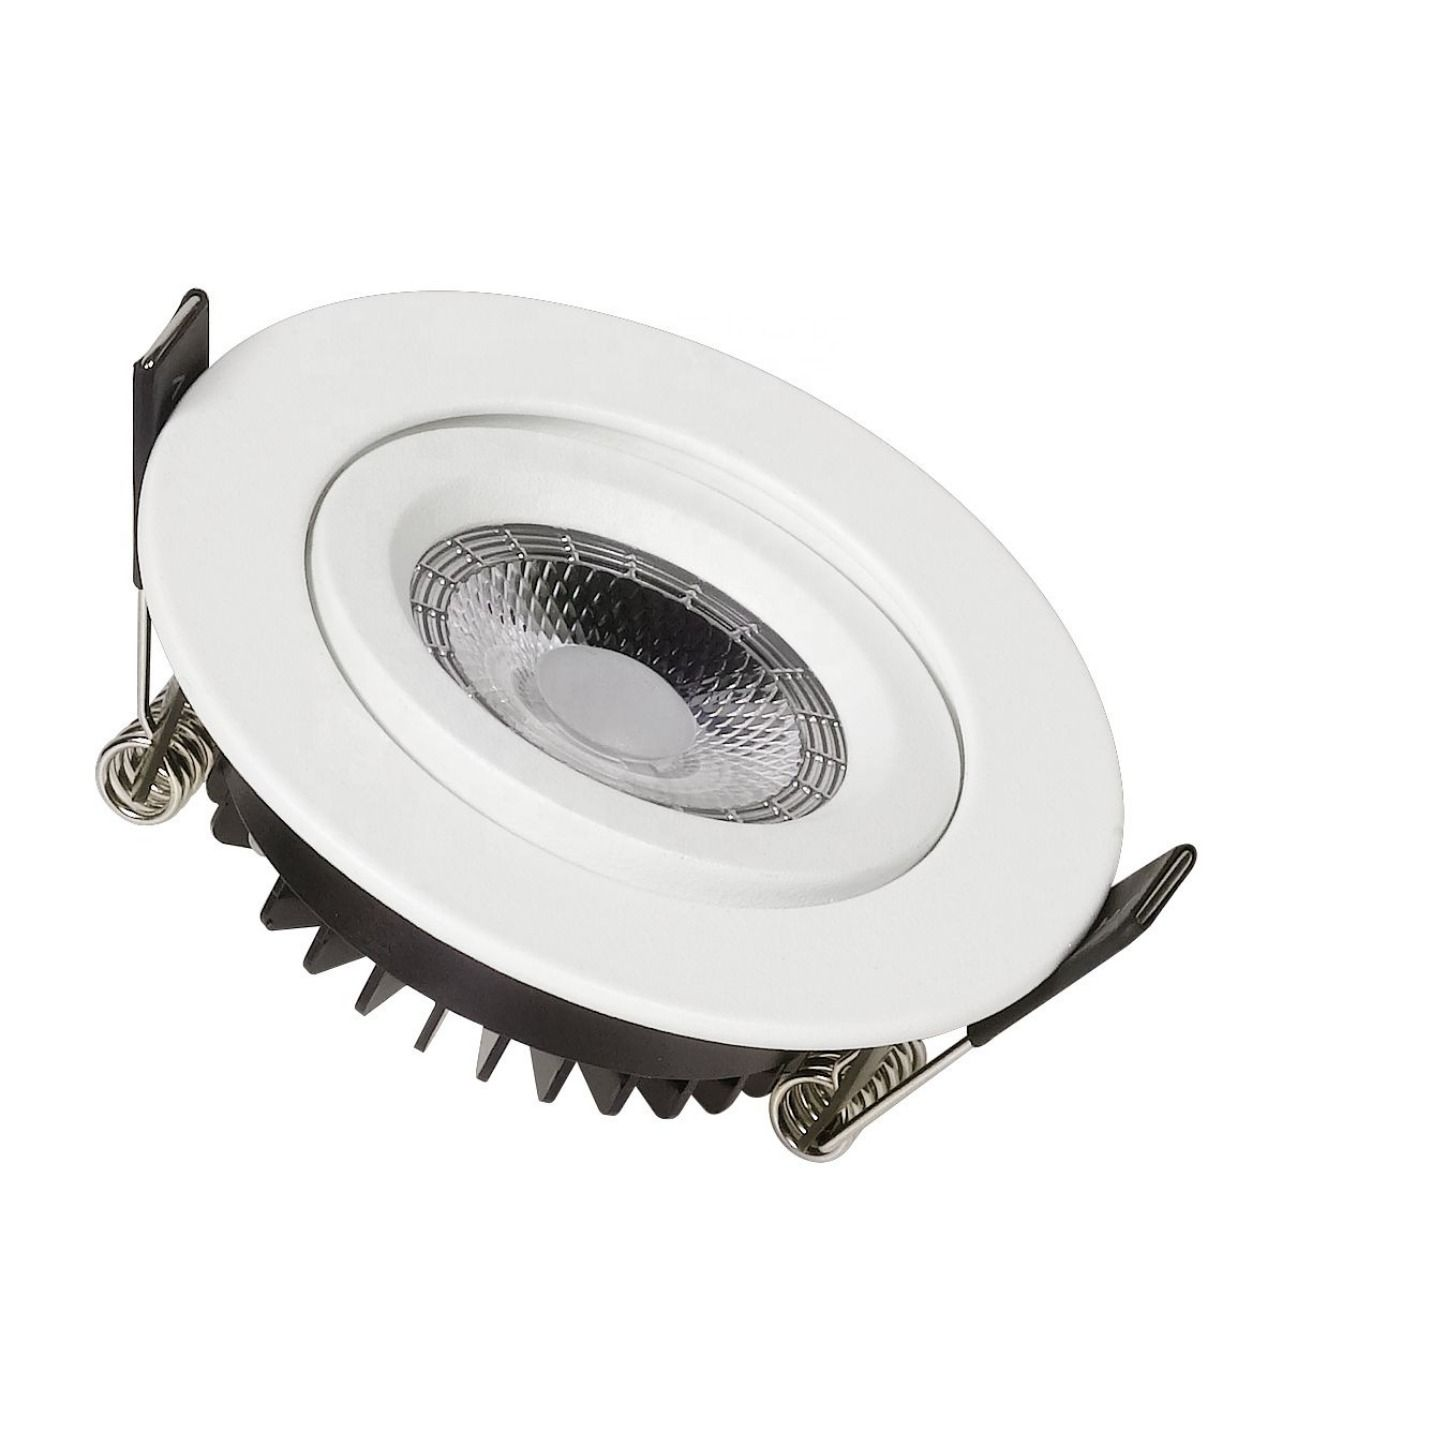 27mm Low Profile Downlight Downlights Recessed Lighting Recessed Spotlights